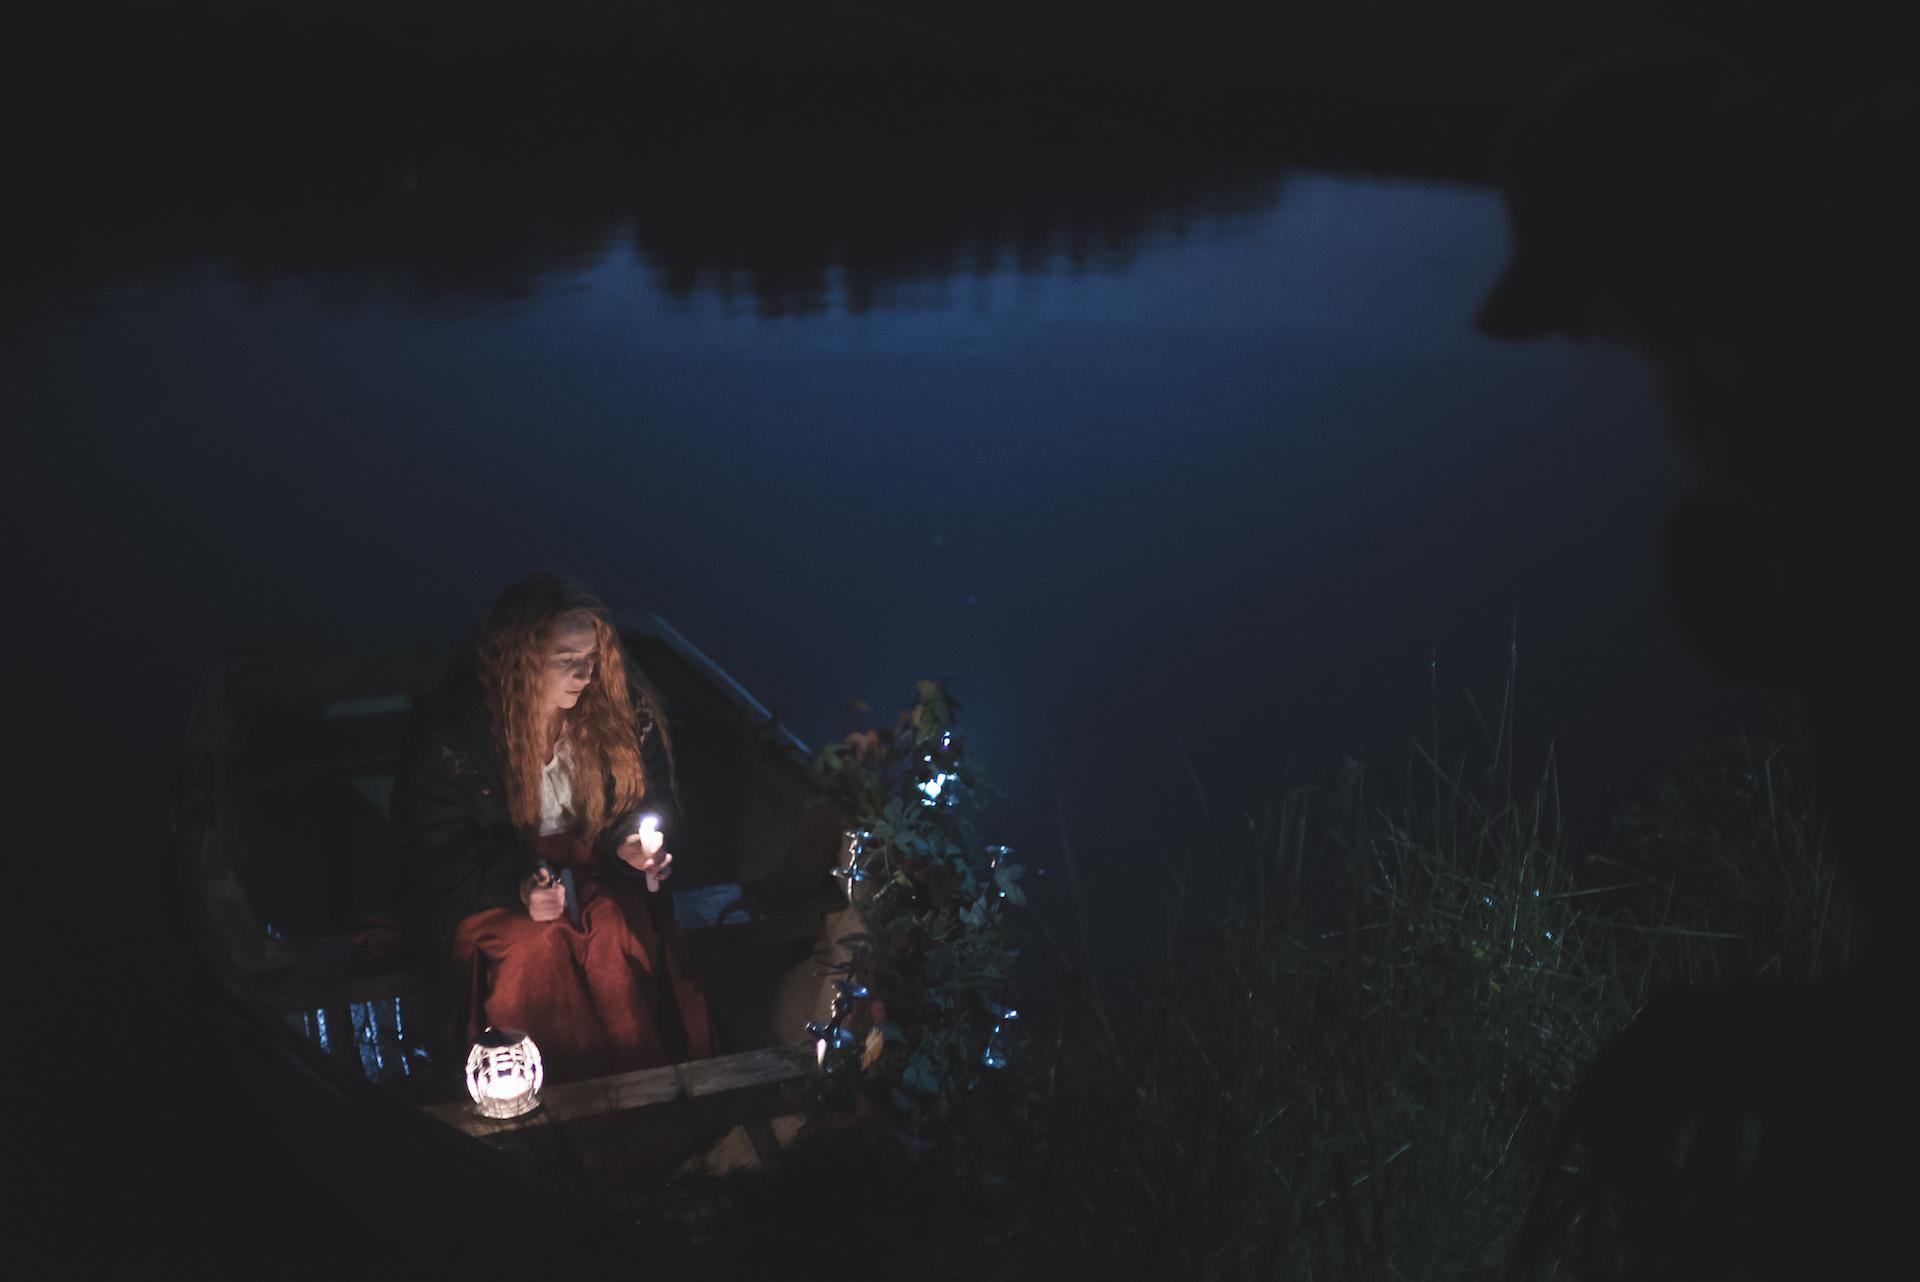 Lady of Shalott - Lantern